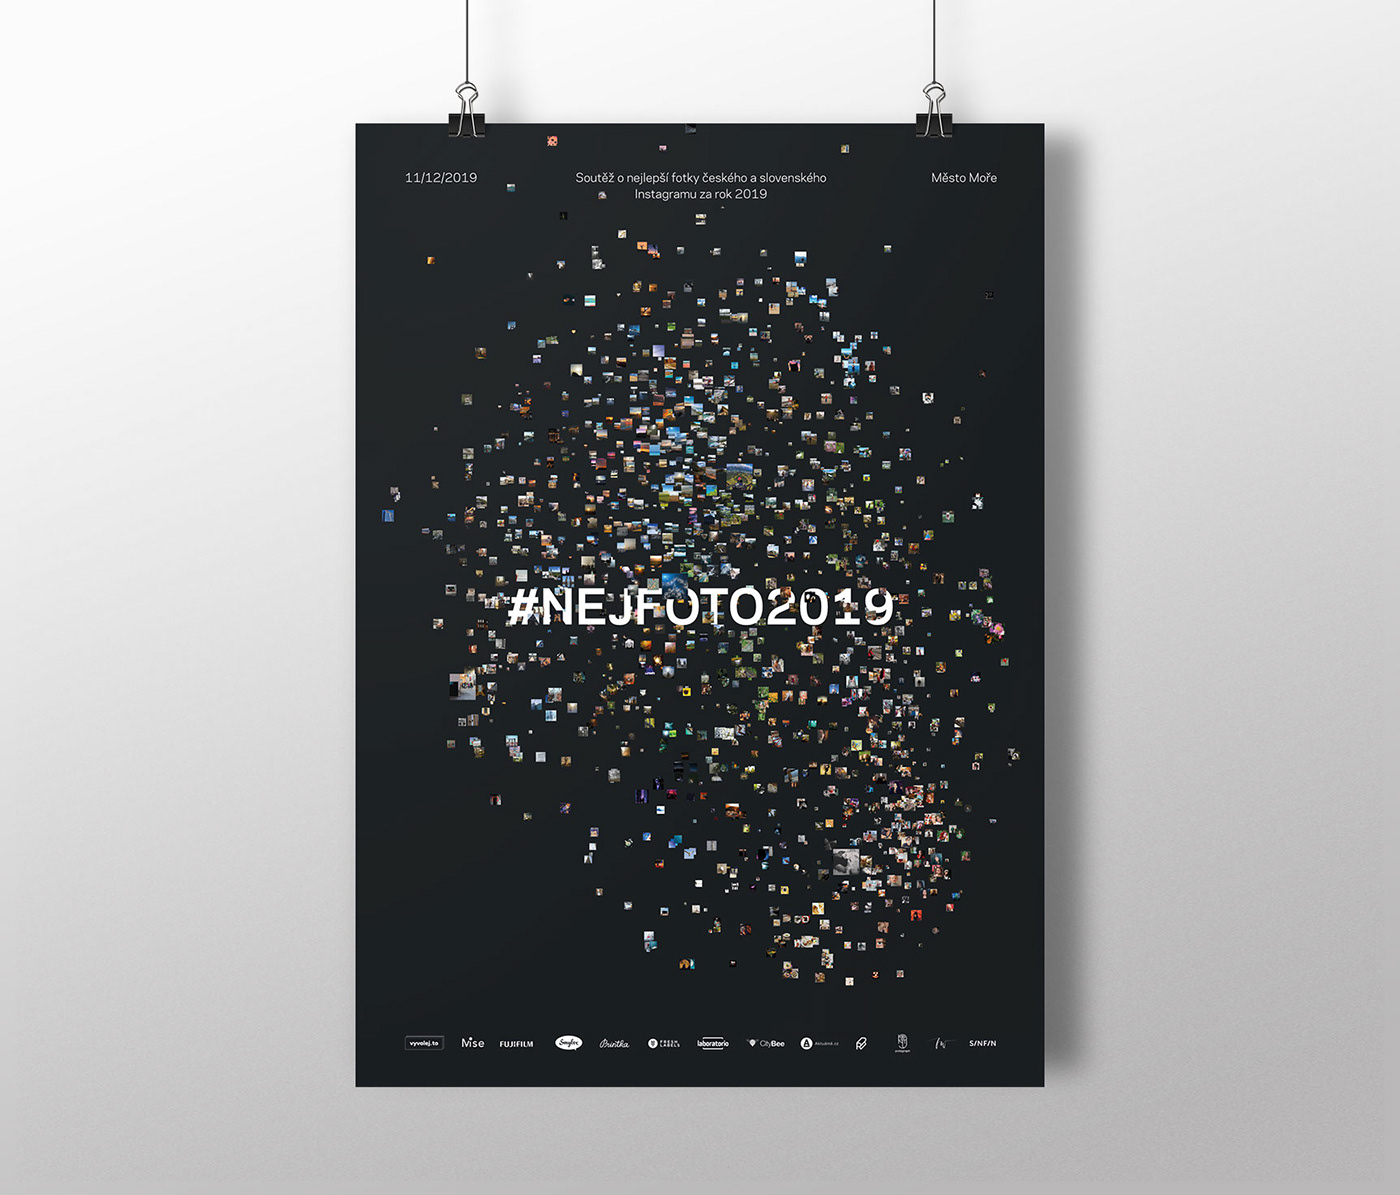 generative design Website t-sne poster